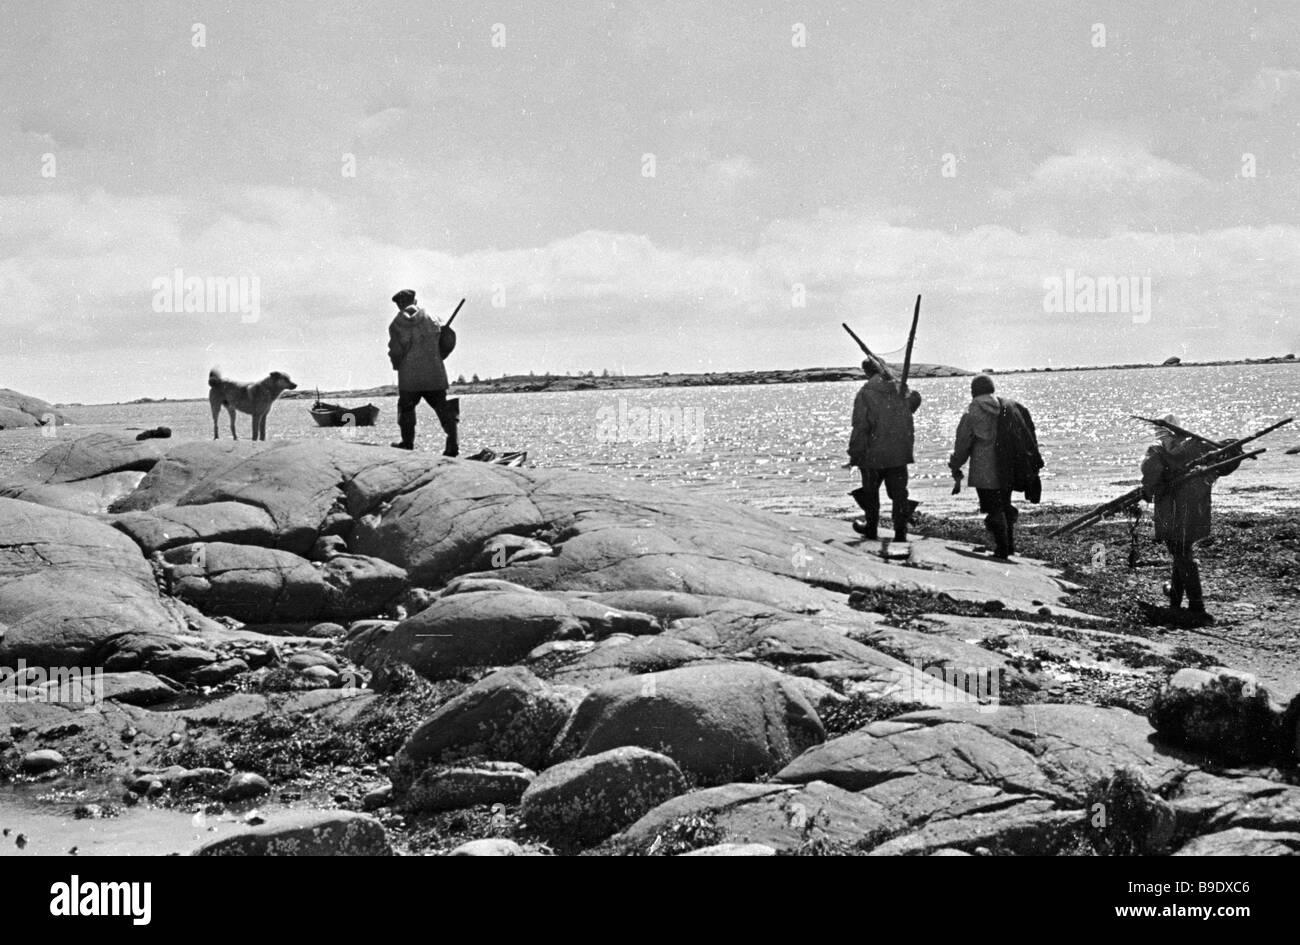 A team of fishermen harvesting seaweed on the White Sea coast - Stock Image